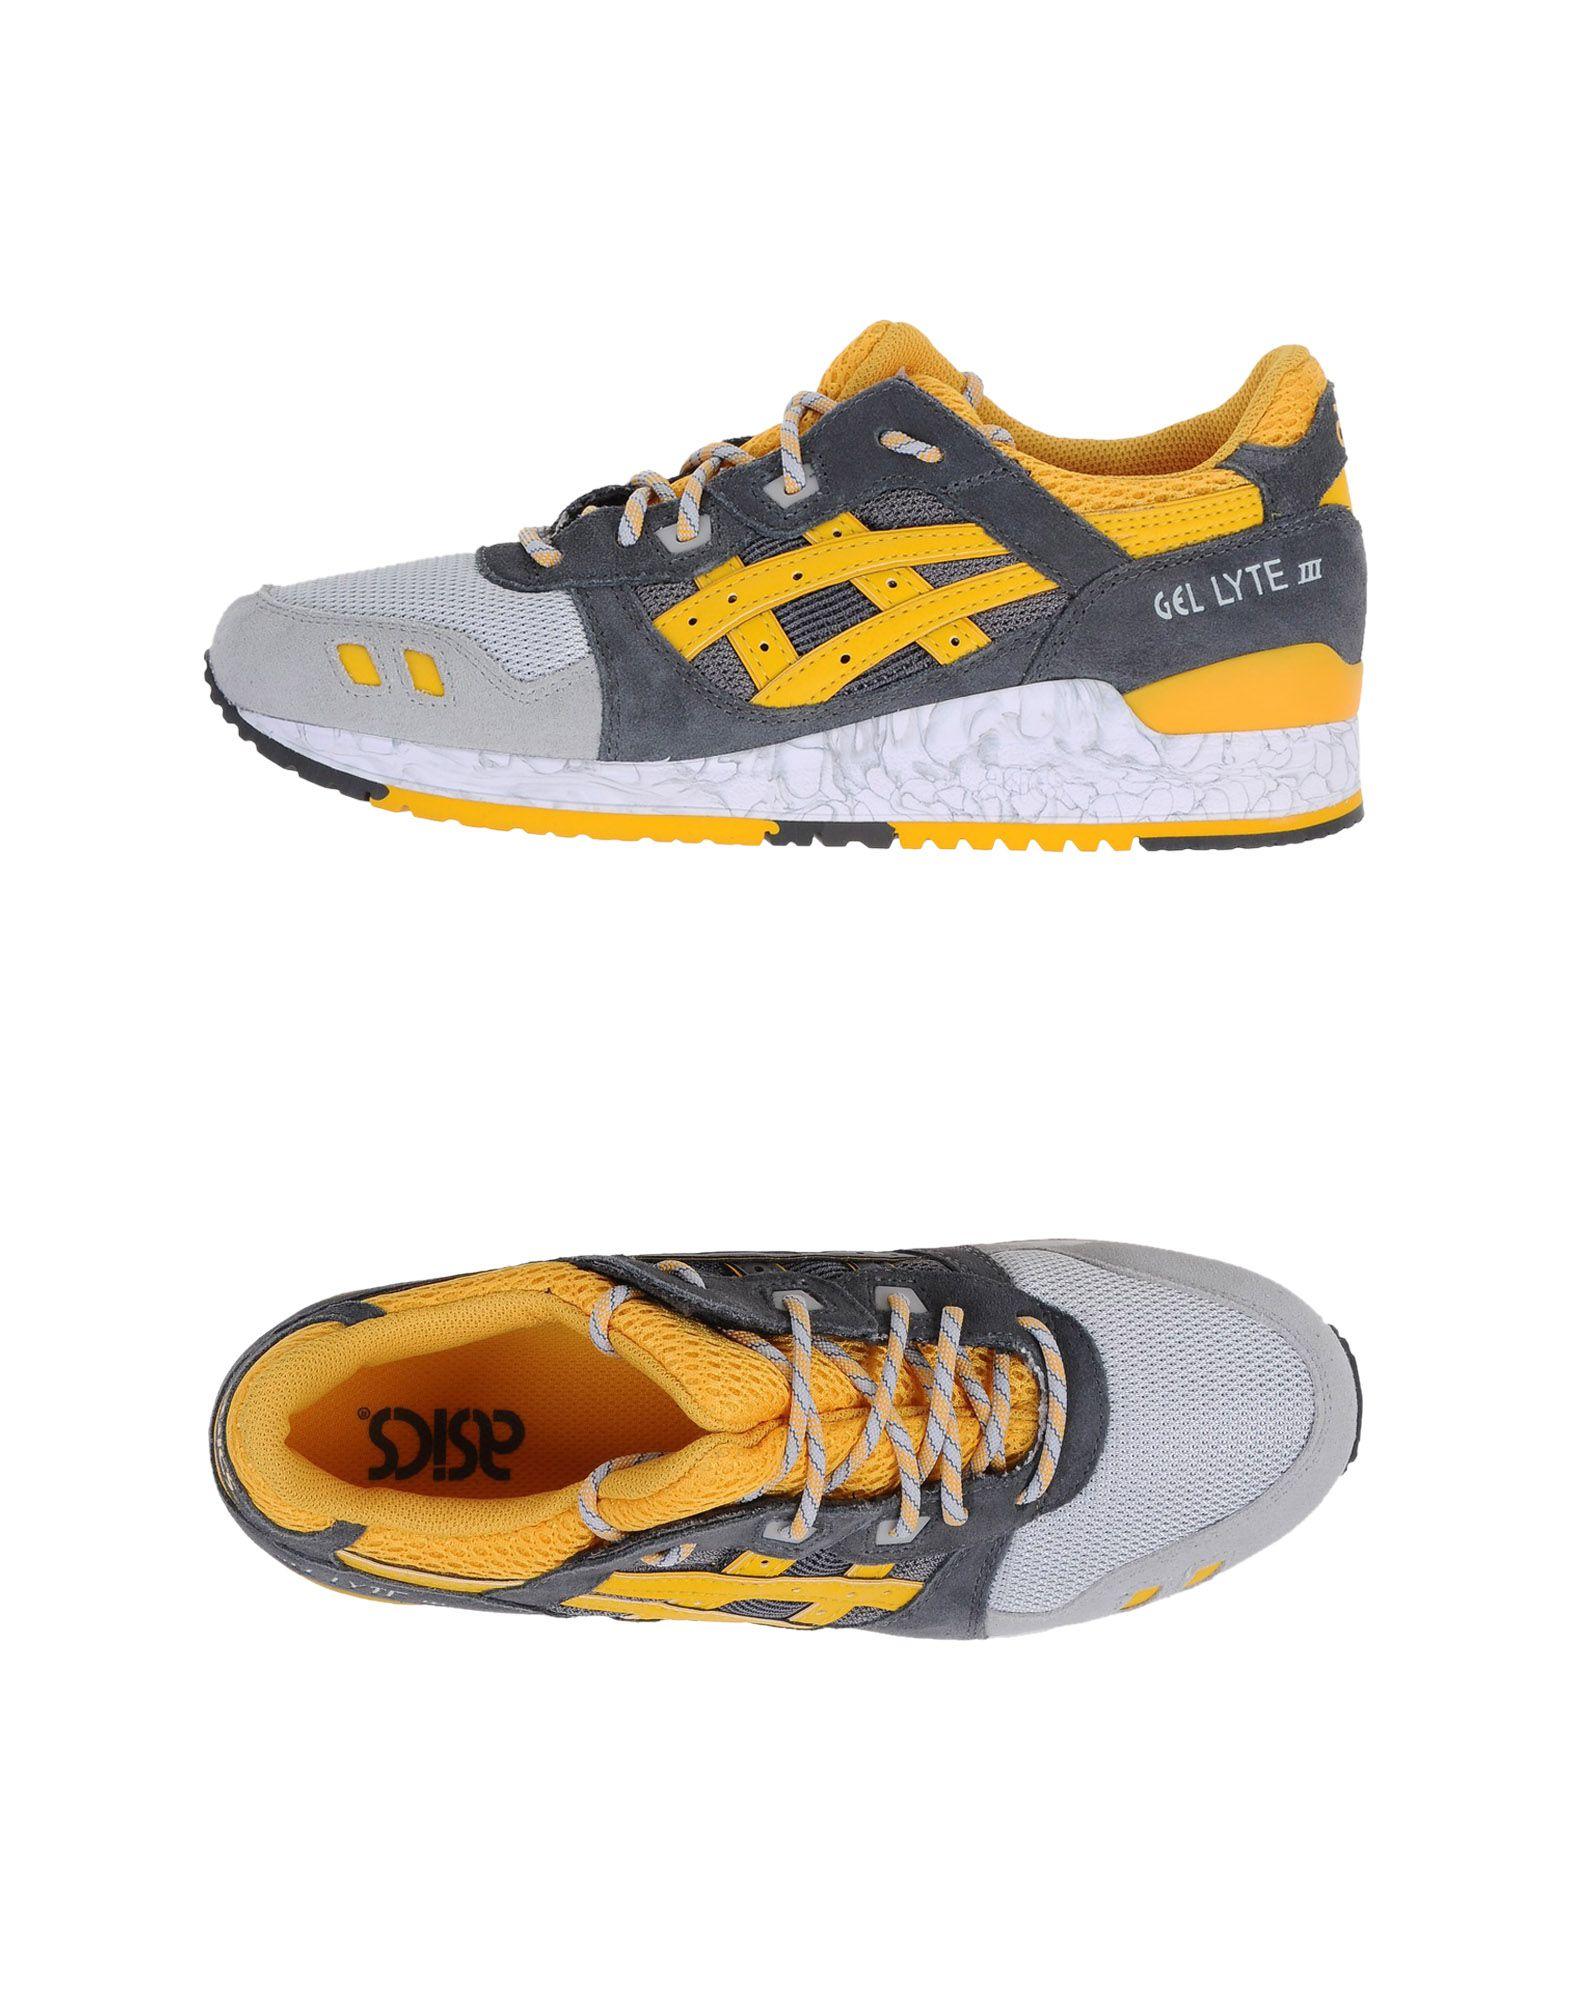 ASICS TIGER Herren Low Sneakers & Tennisschuhe Farbe Grau Größe 15